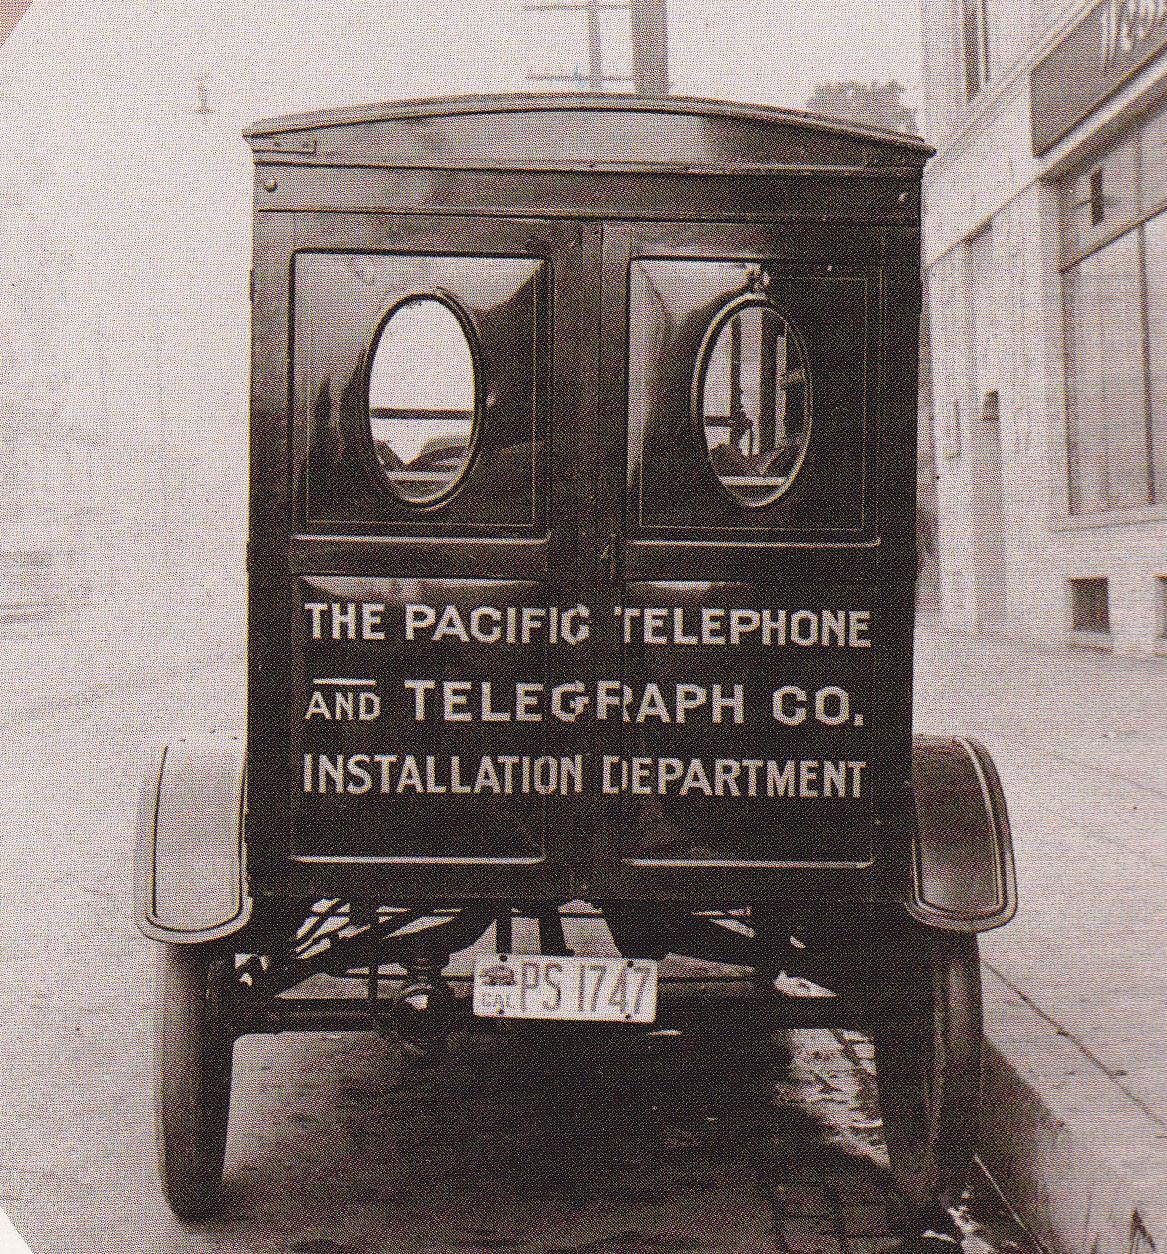 telefon kurma şirketi - 1920